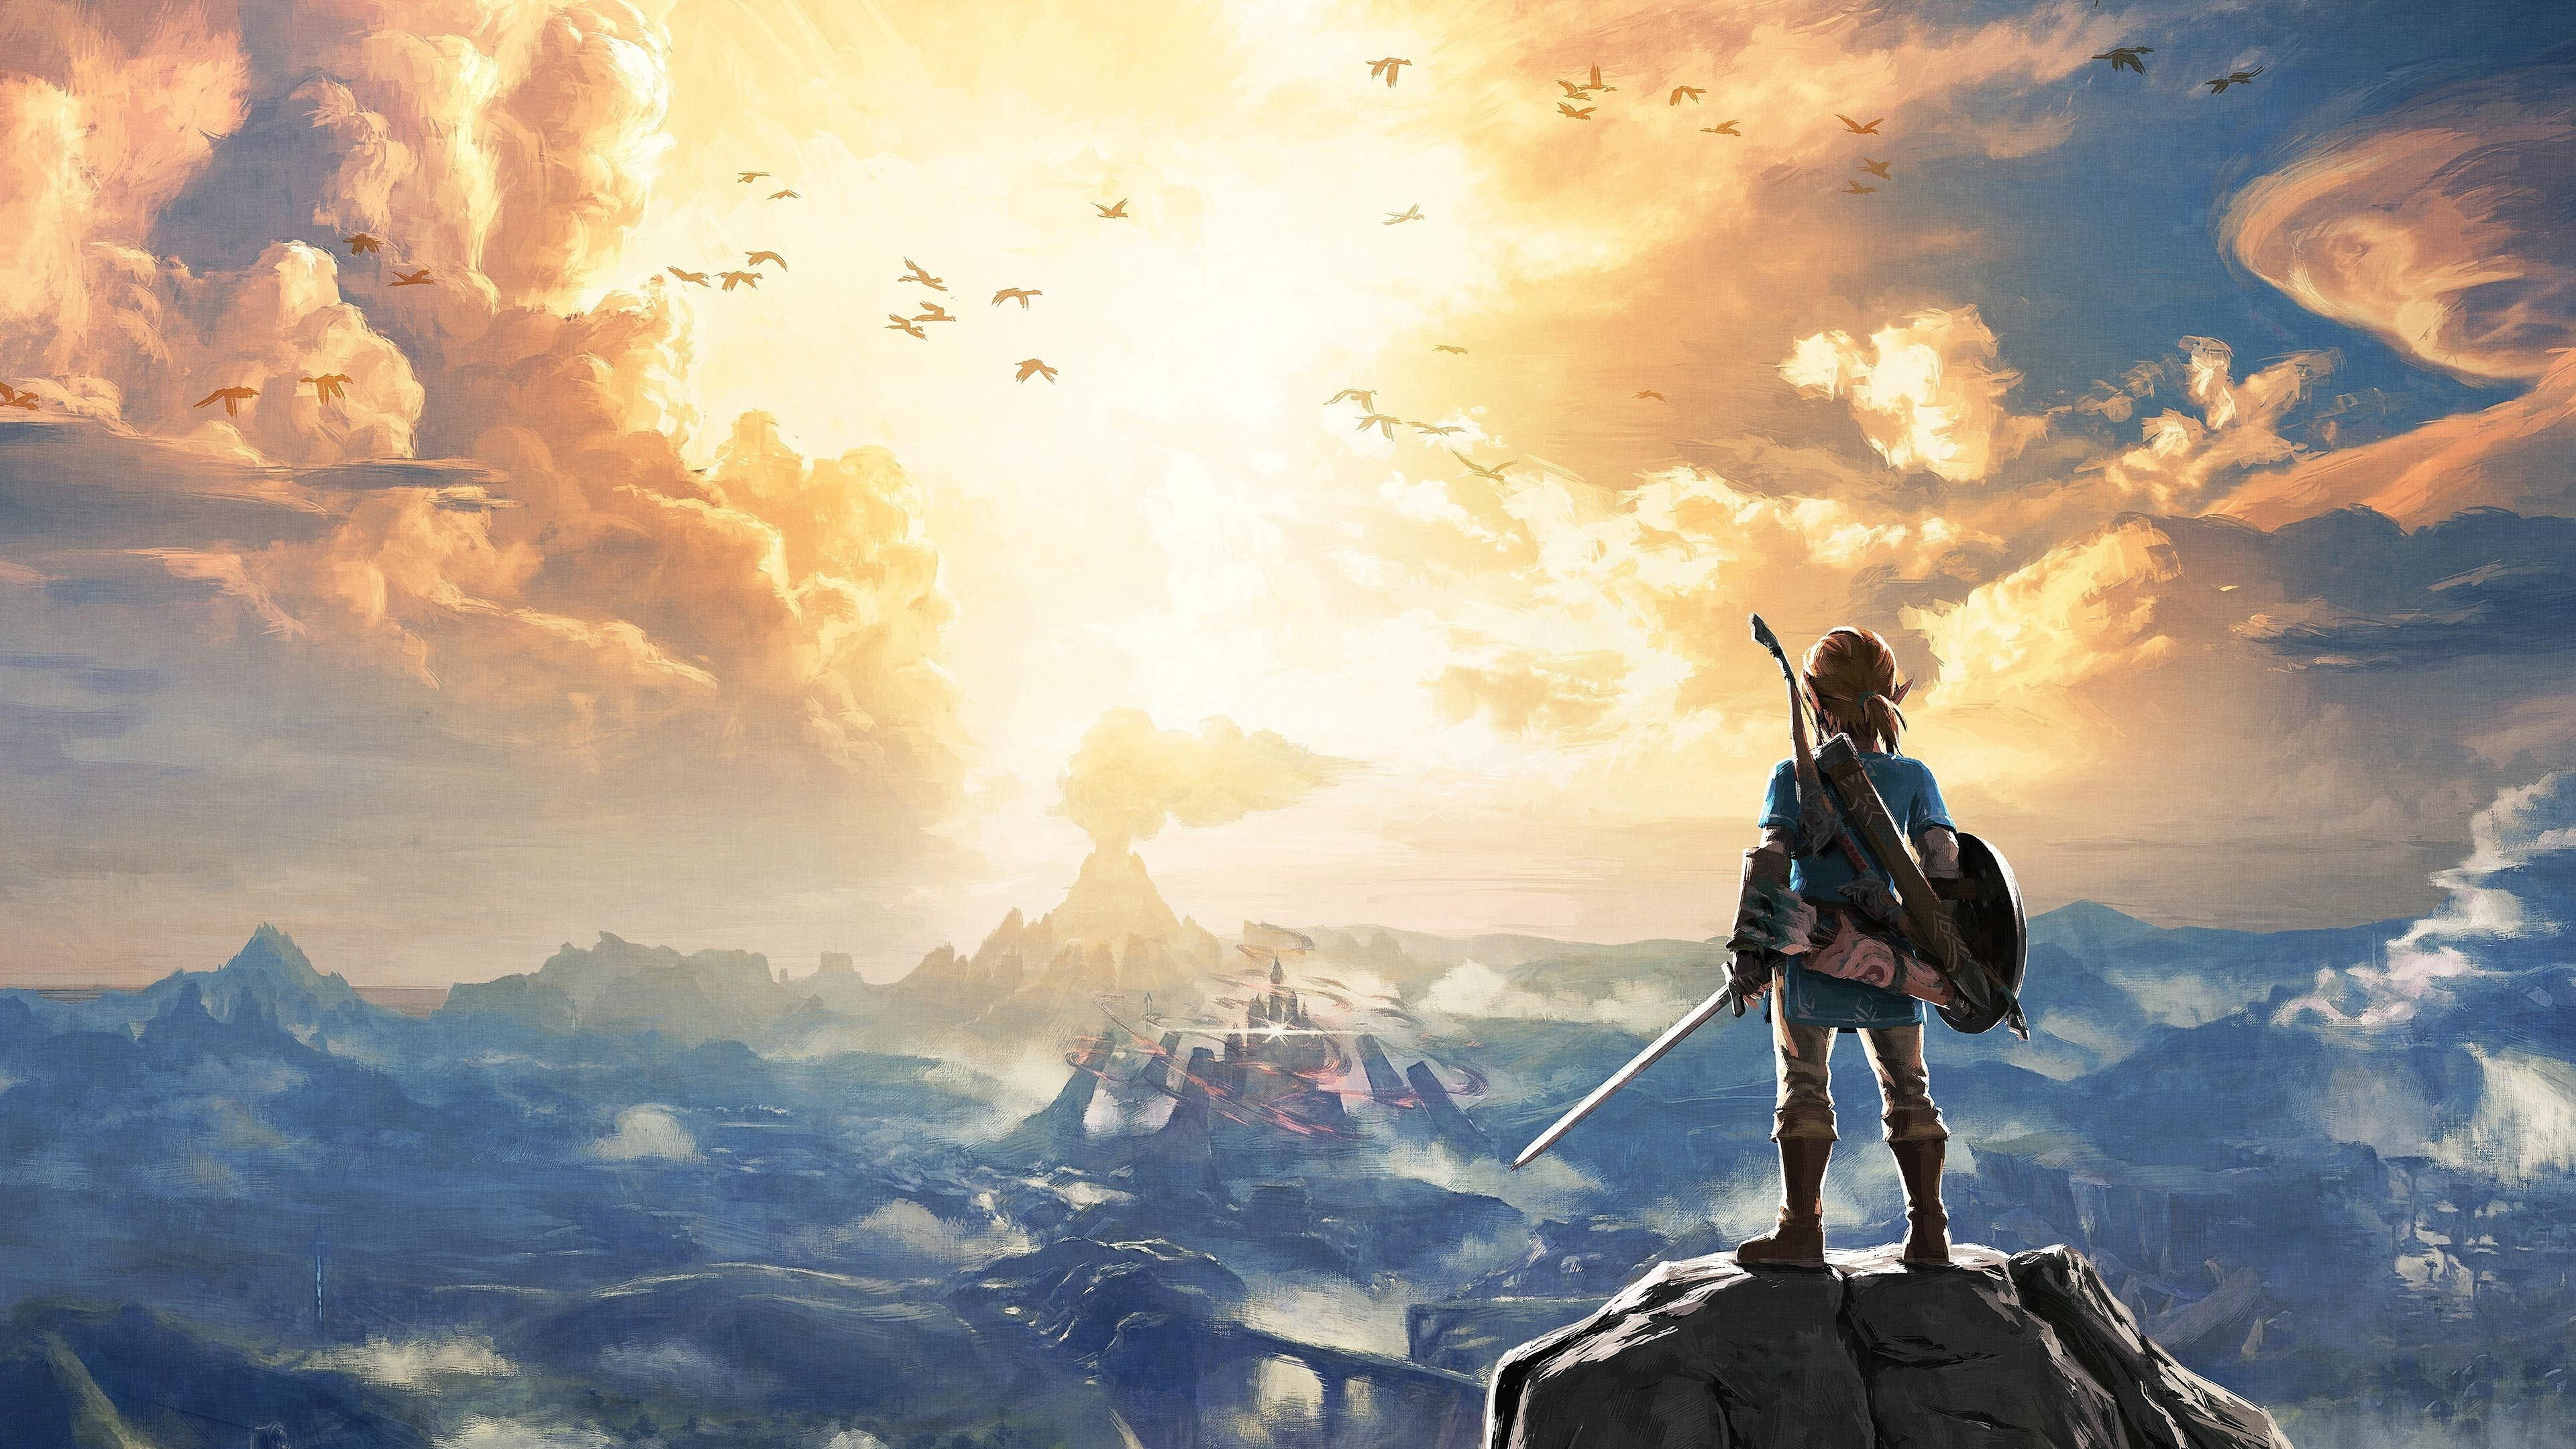 The Legend Of Zelda Wallpaper (79+ Images